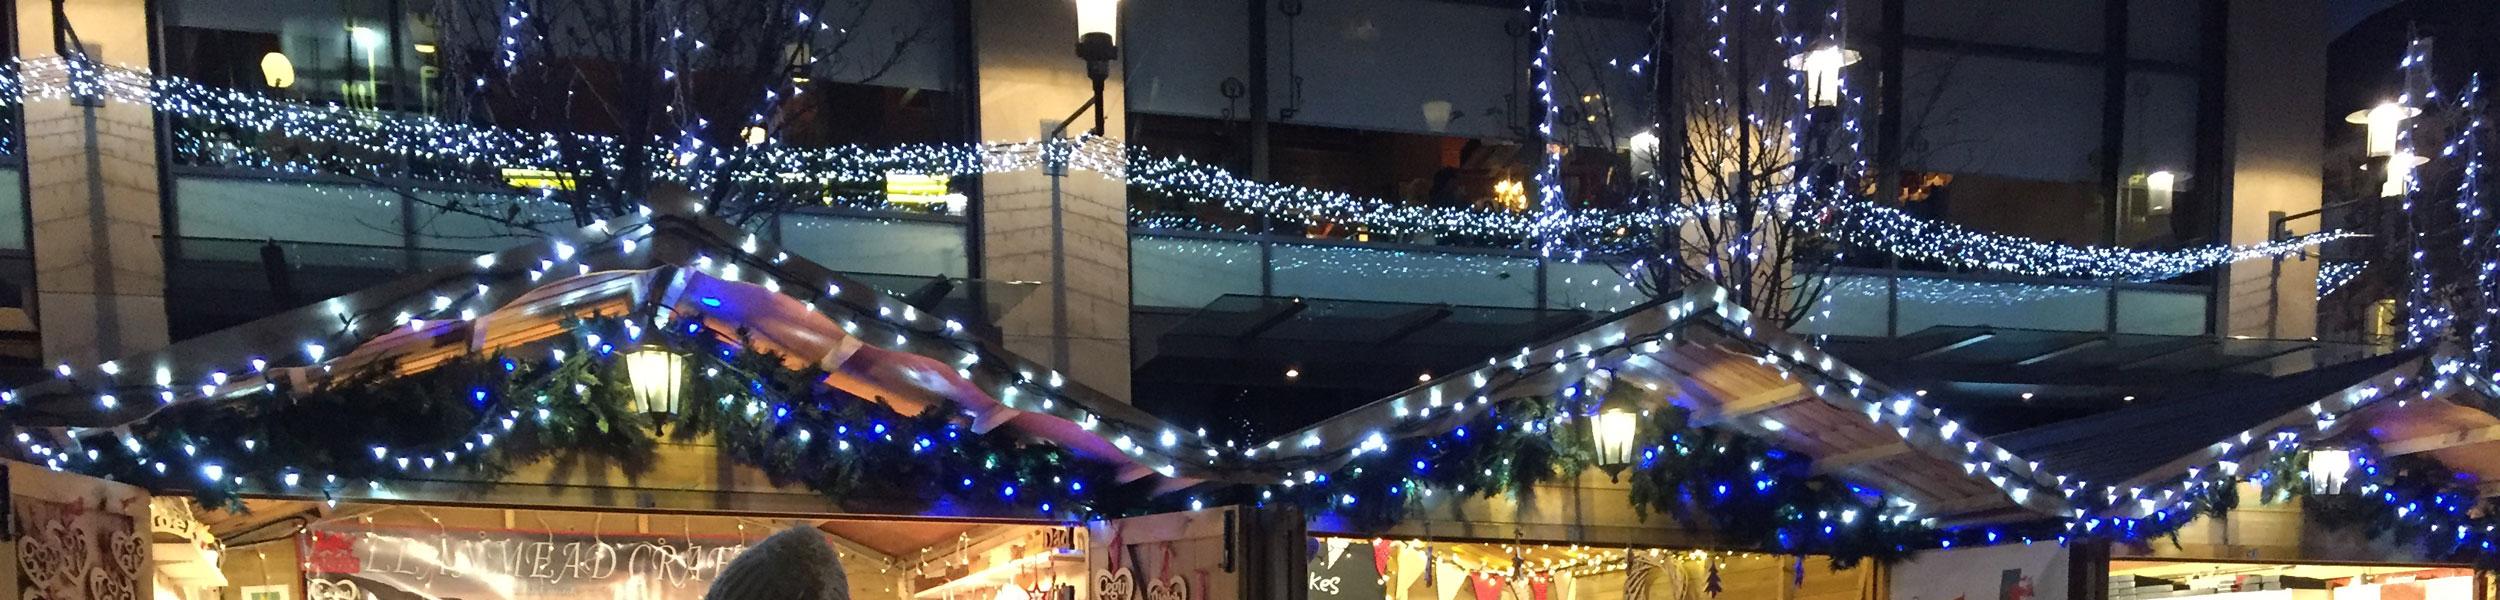 cardiff-christmas-market-03